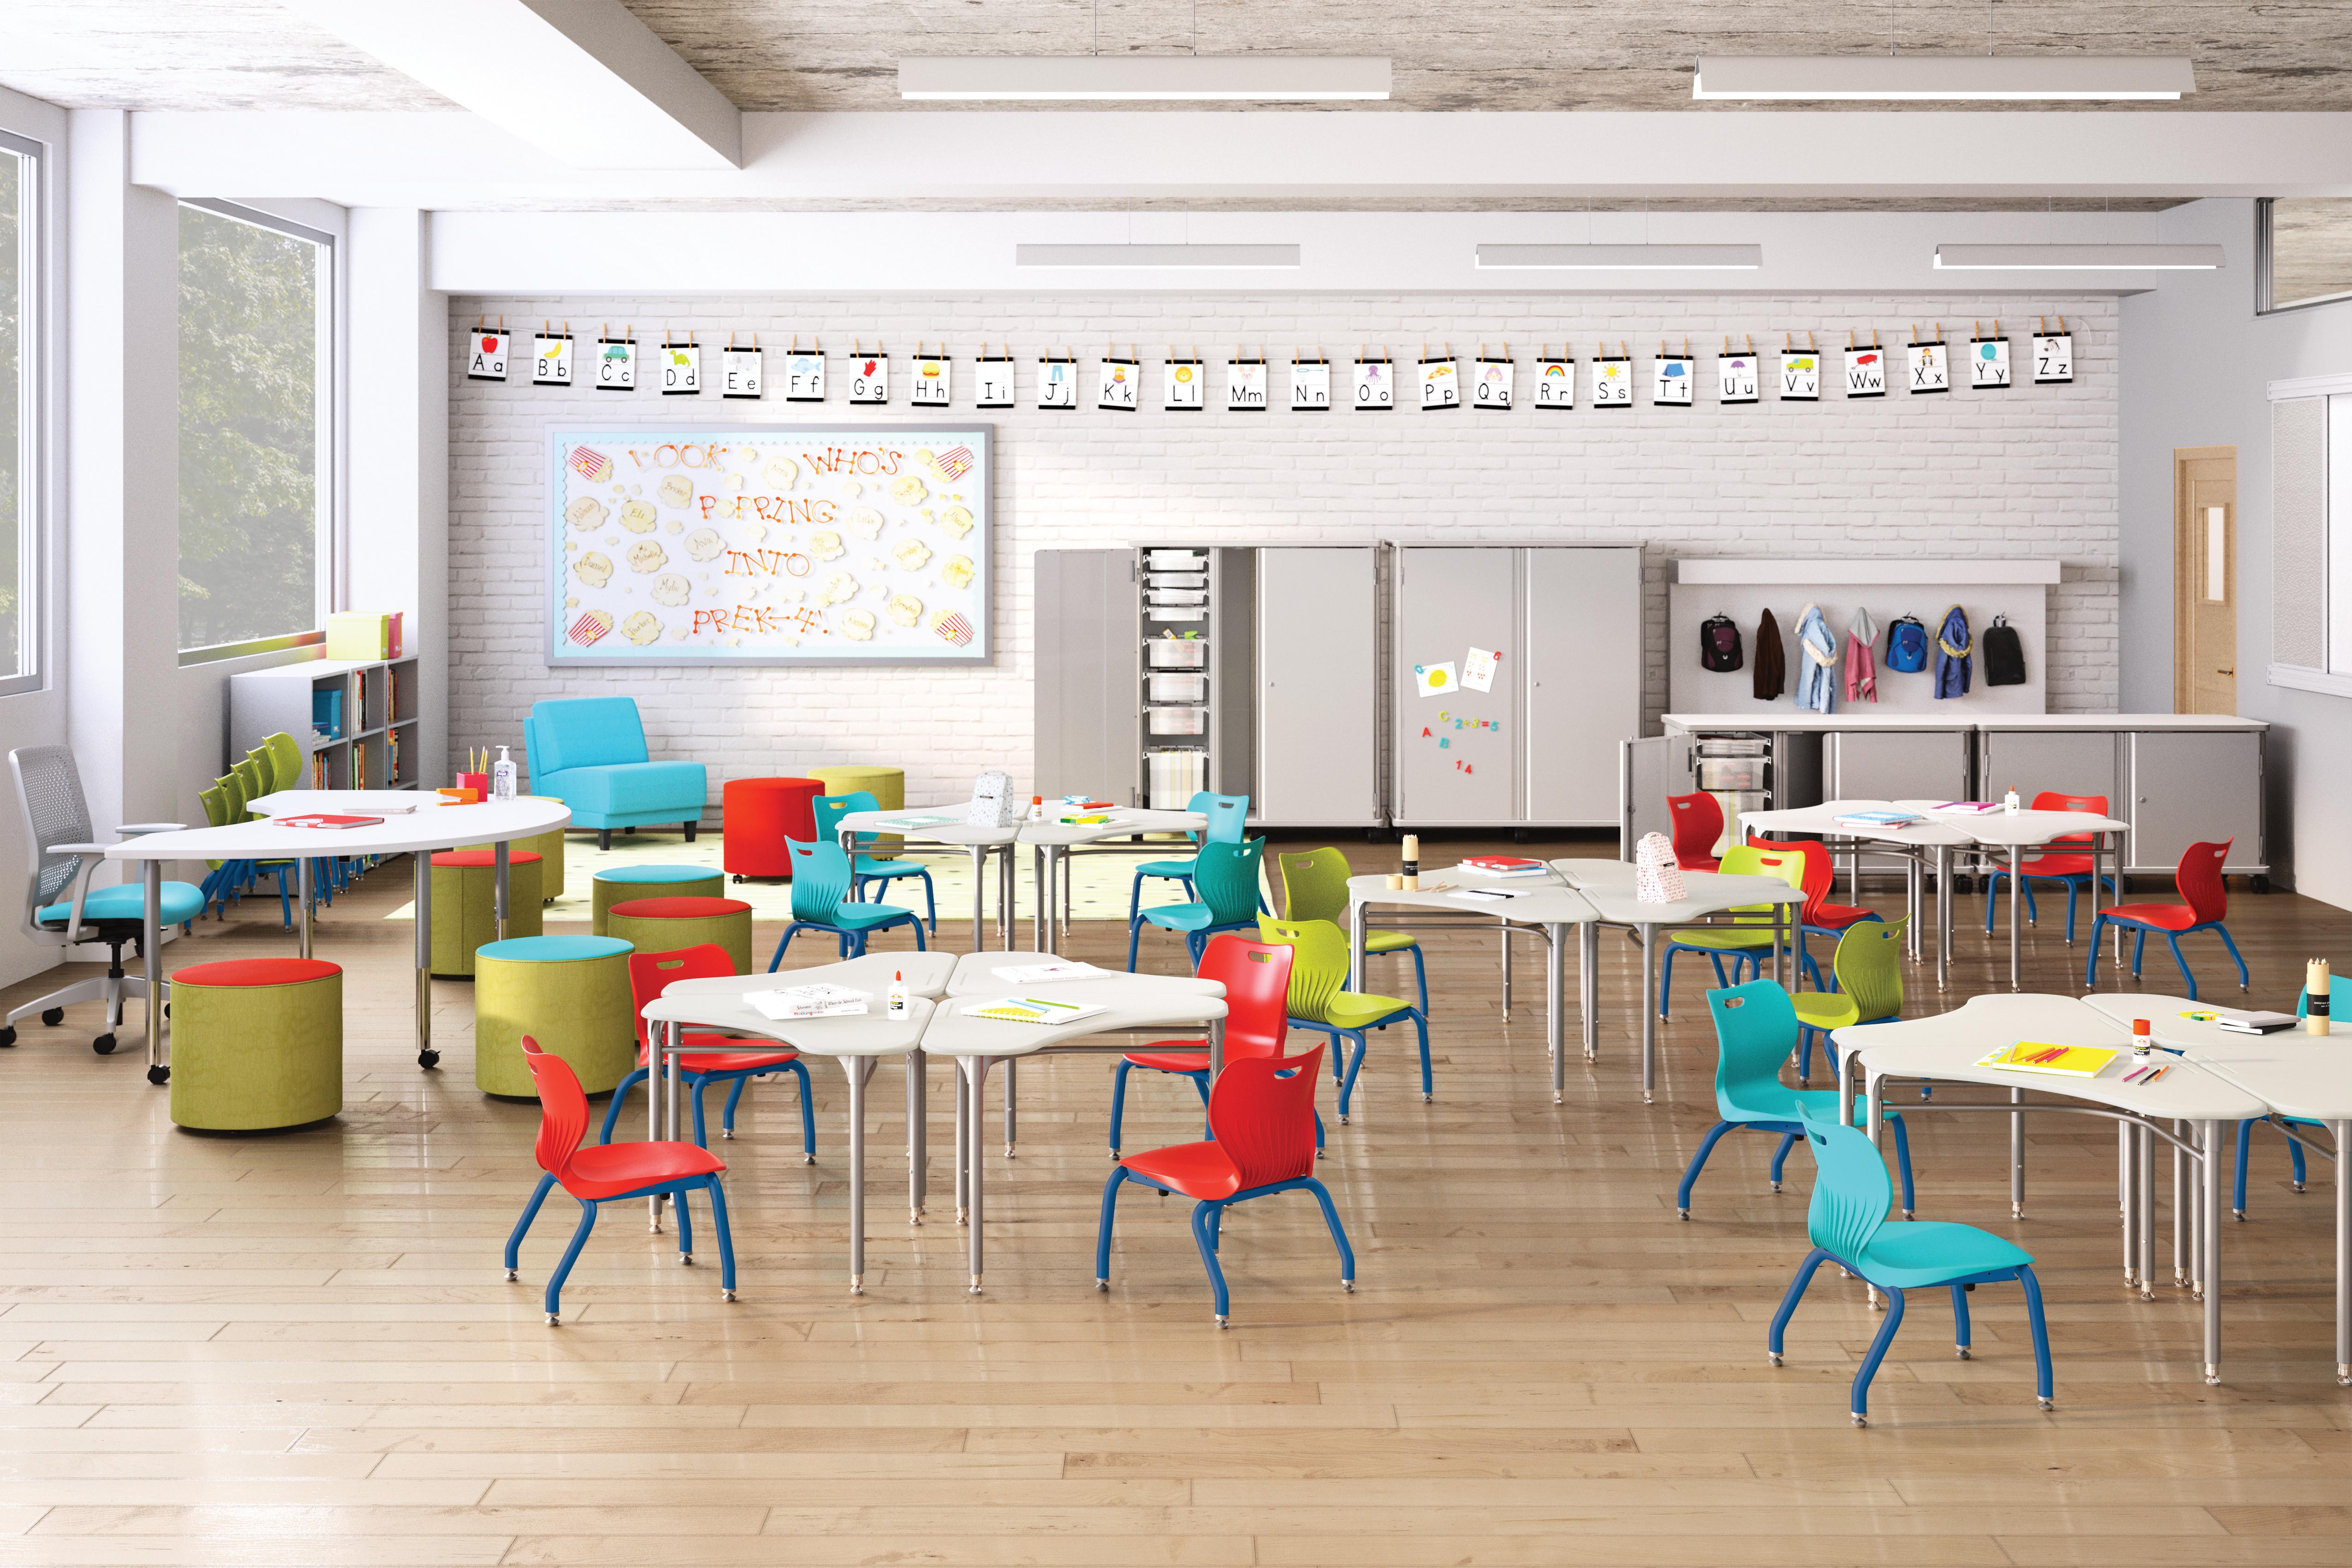 Education Room Fun